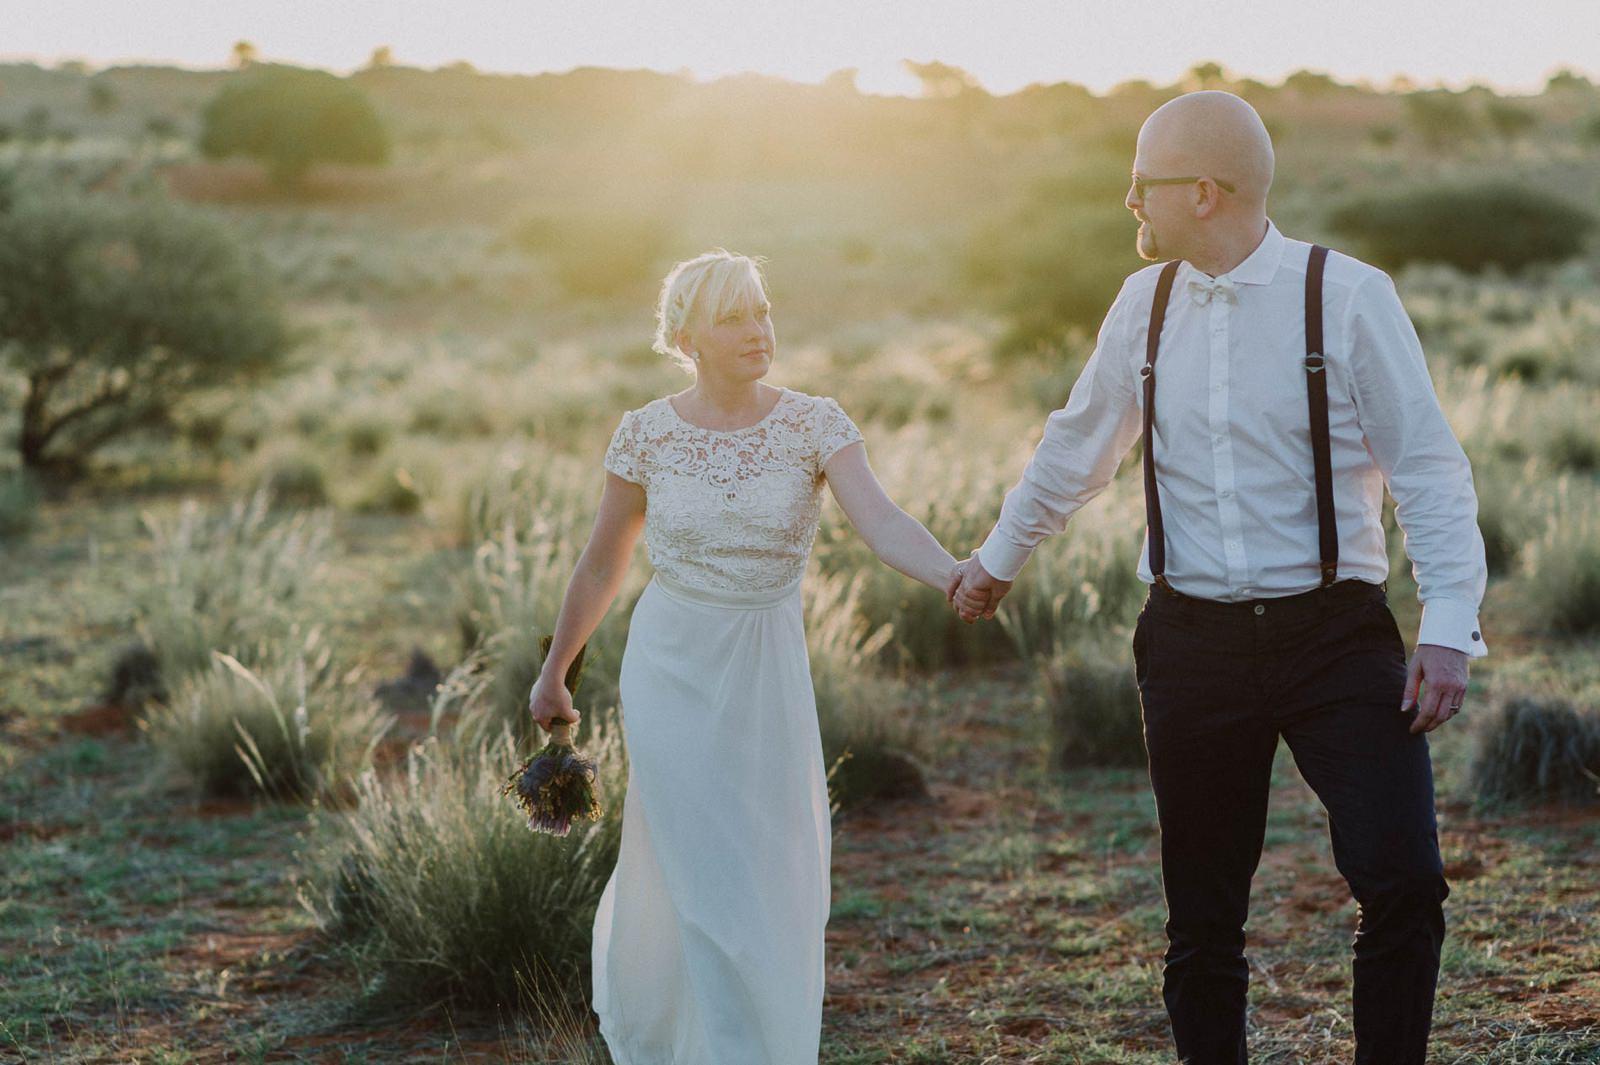 heiraten-in-namibia-8191.jpg